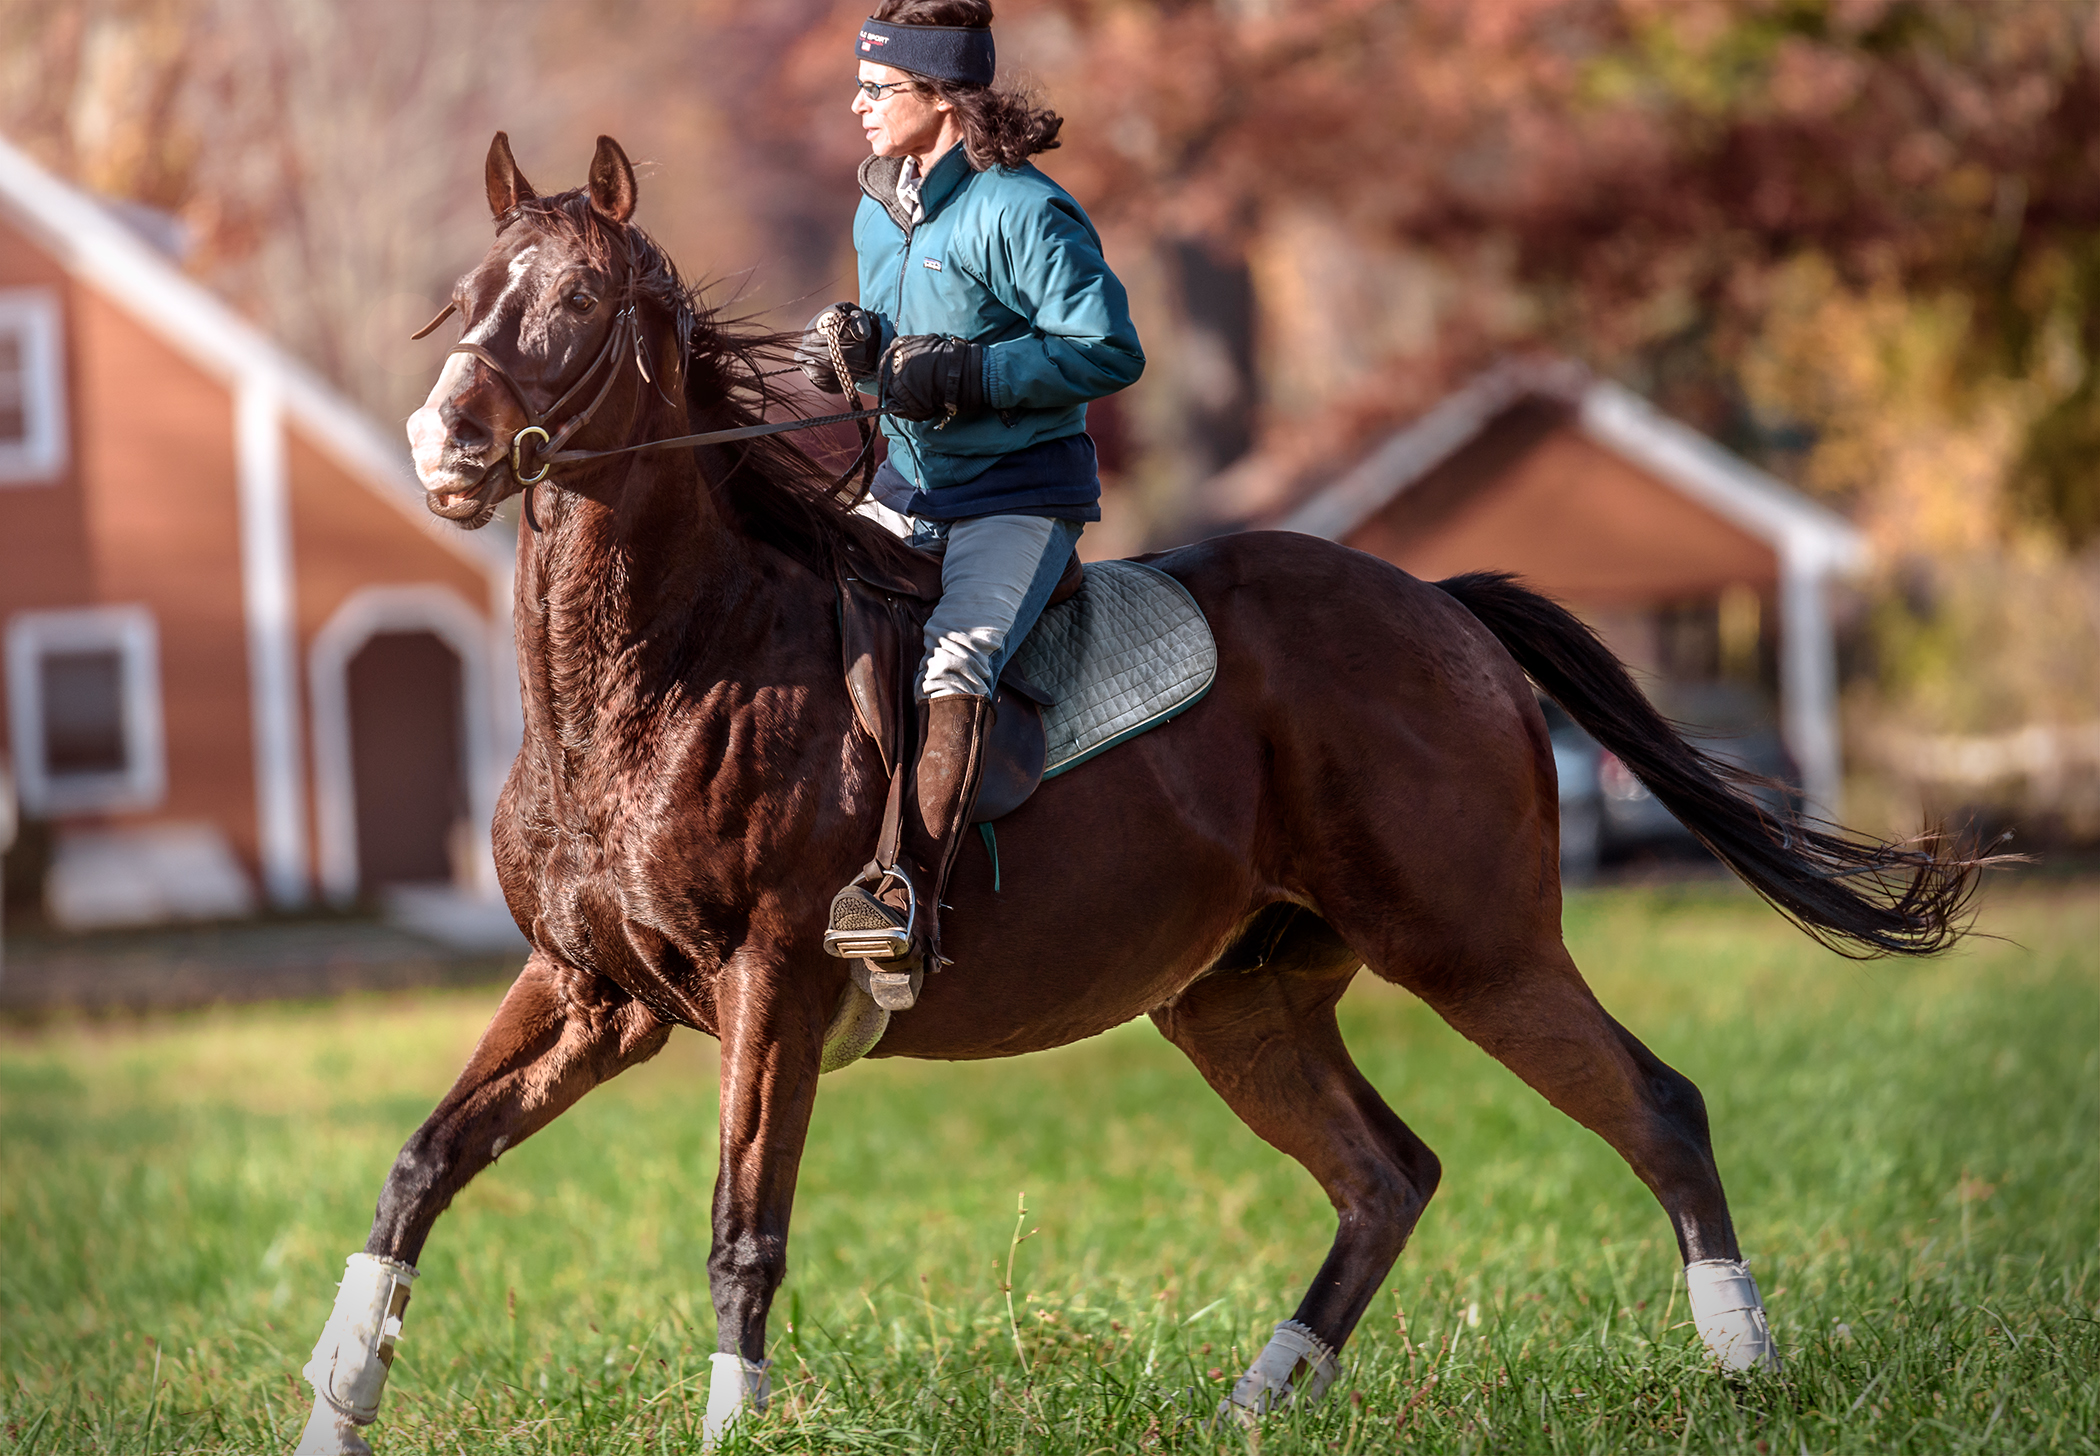 SUNY_Westbury_horse_action.jpg